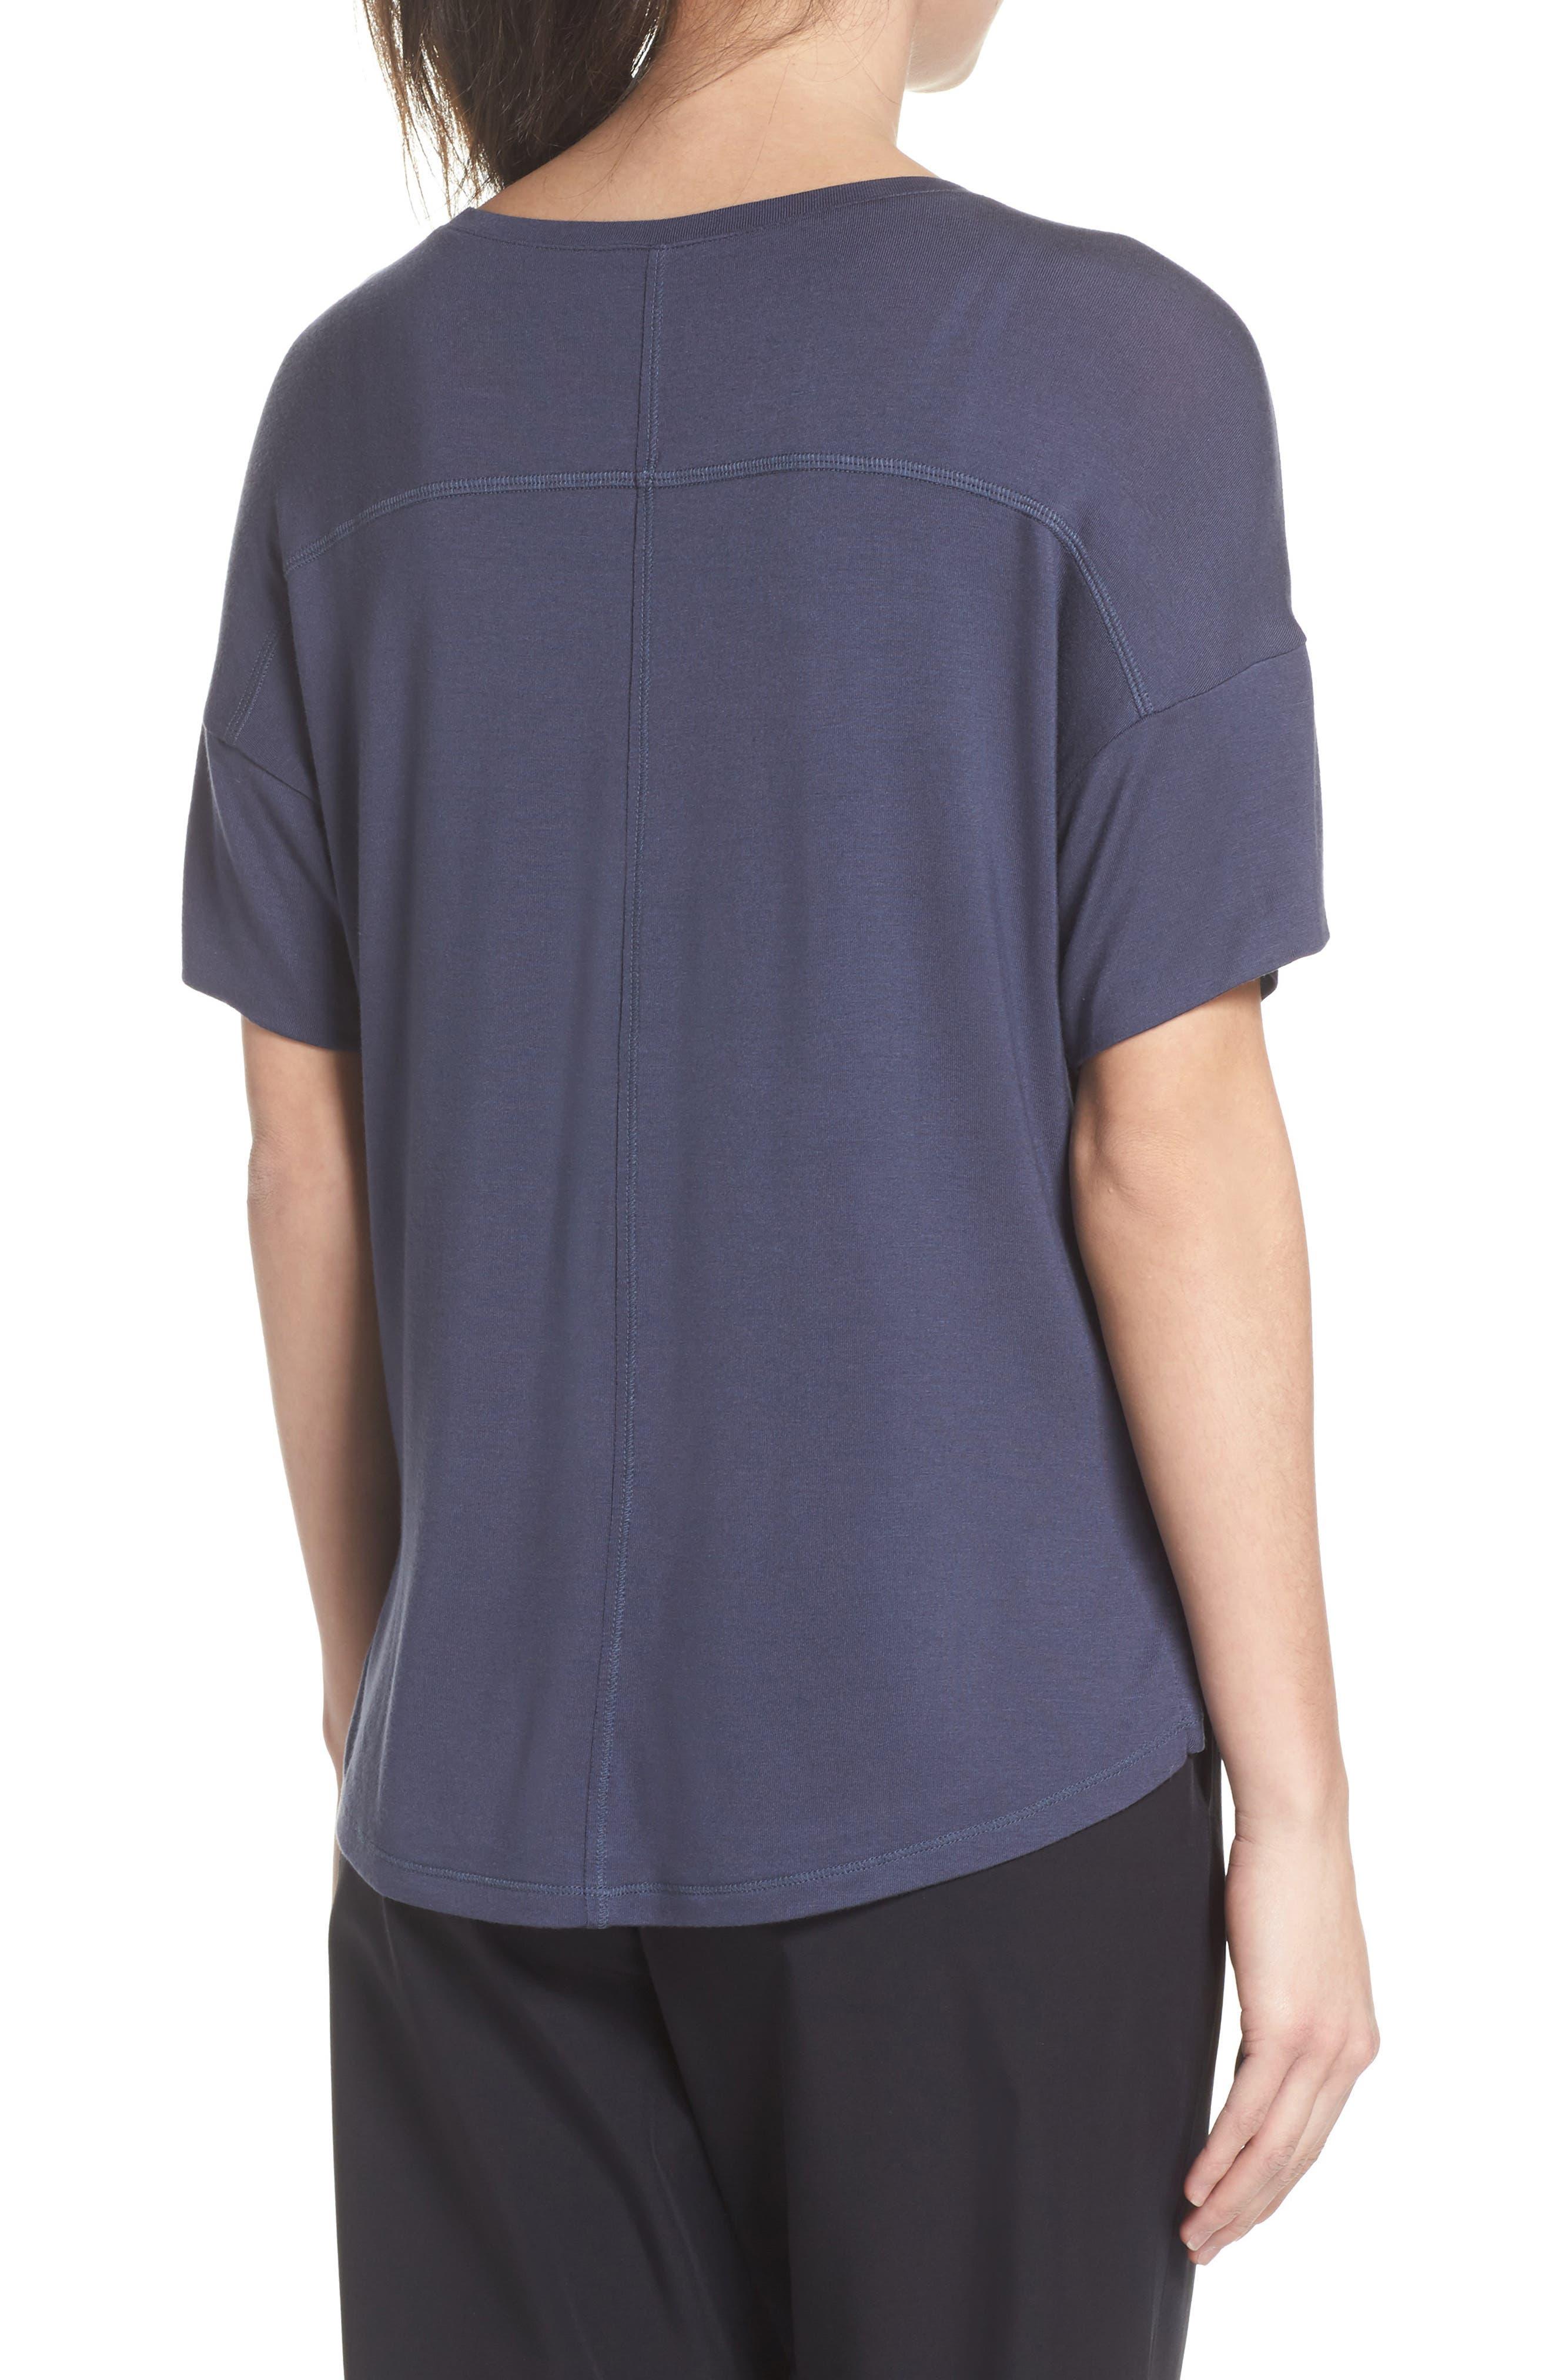 ZELLA,                             New Energy T-Shirt,                             Alternate thumbnail 2, color,                             GREY SLATE